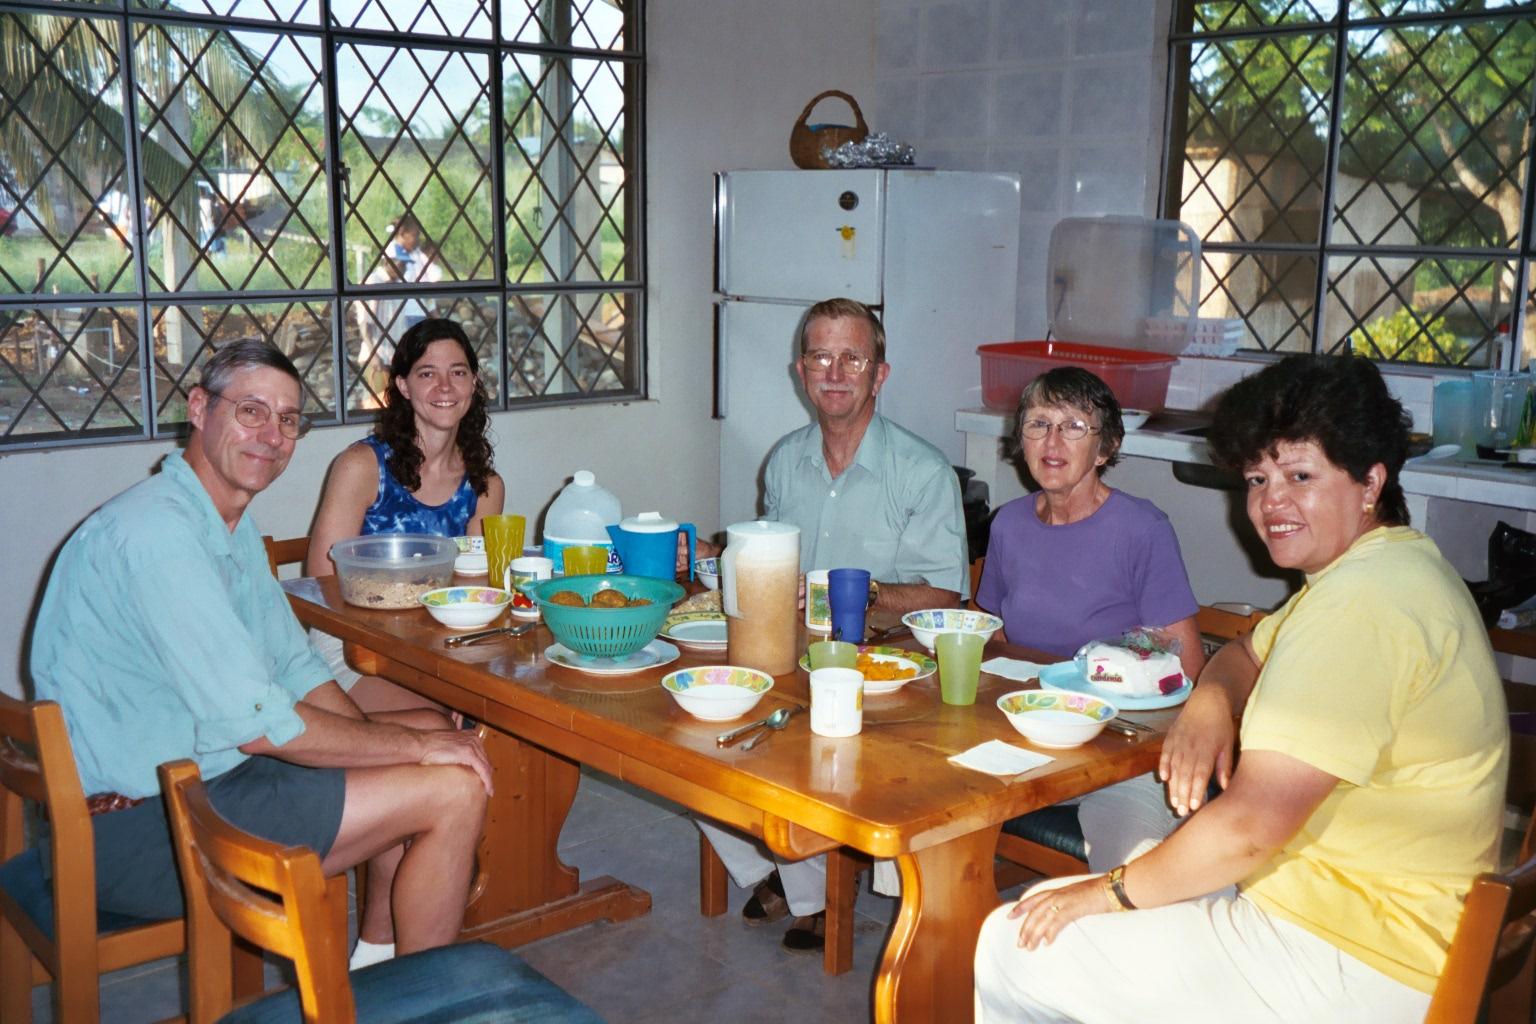 Rob, Jane, John & Mary Doerfer, plastic surgeon